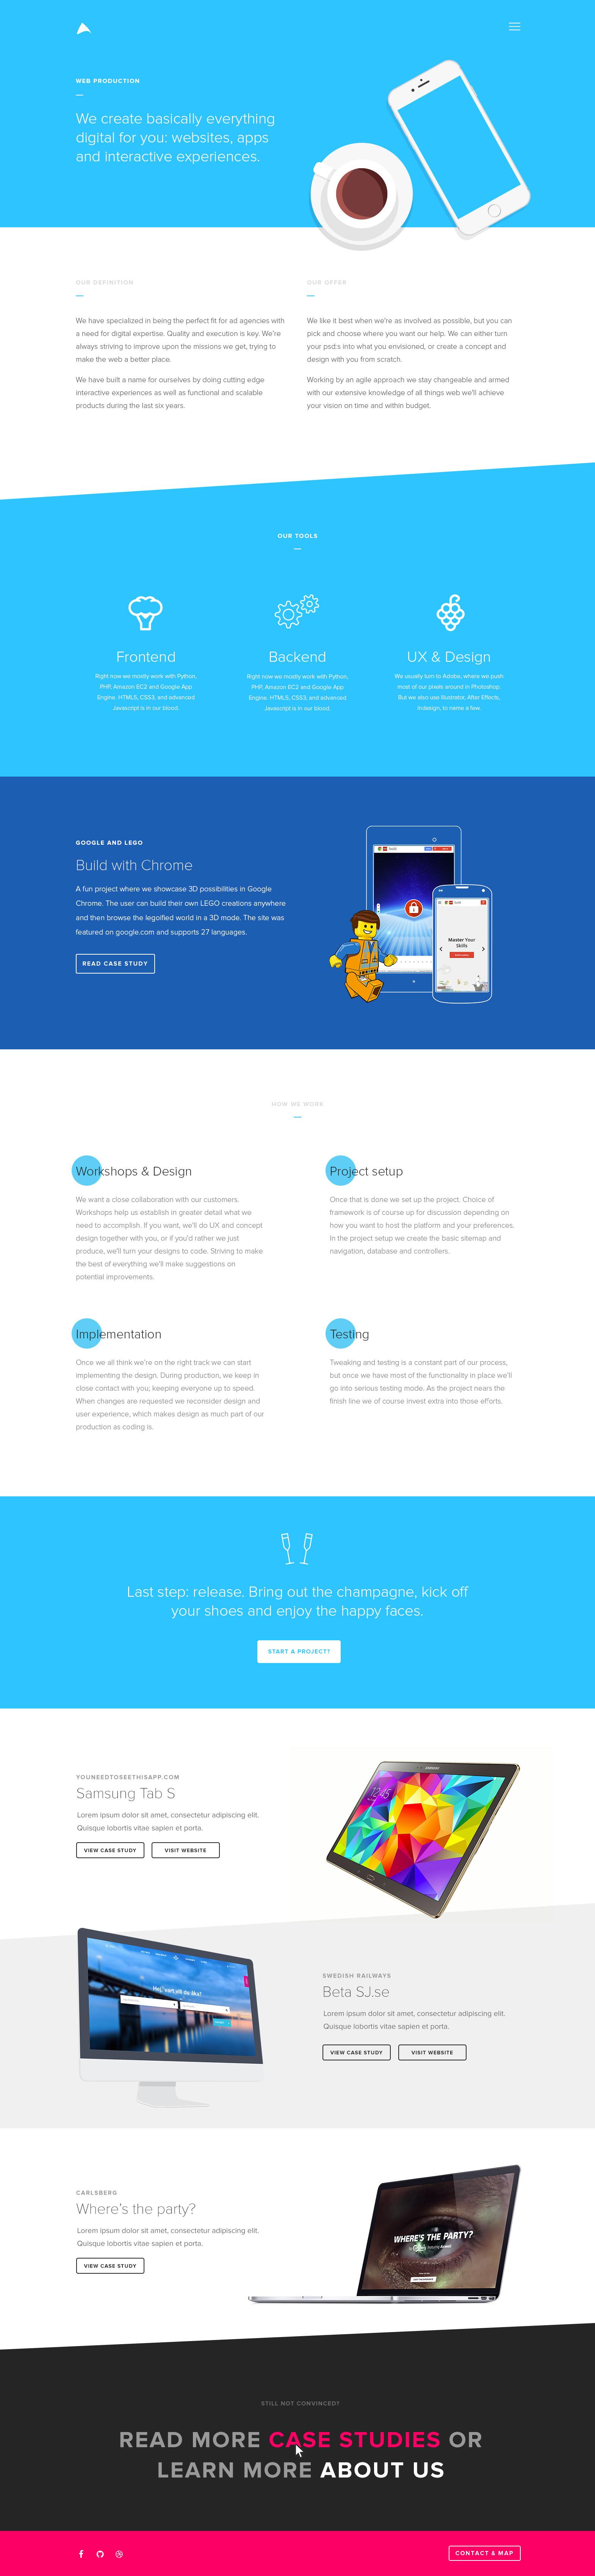 Webproduction